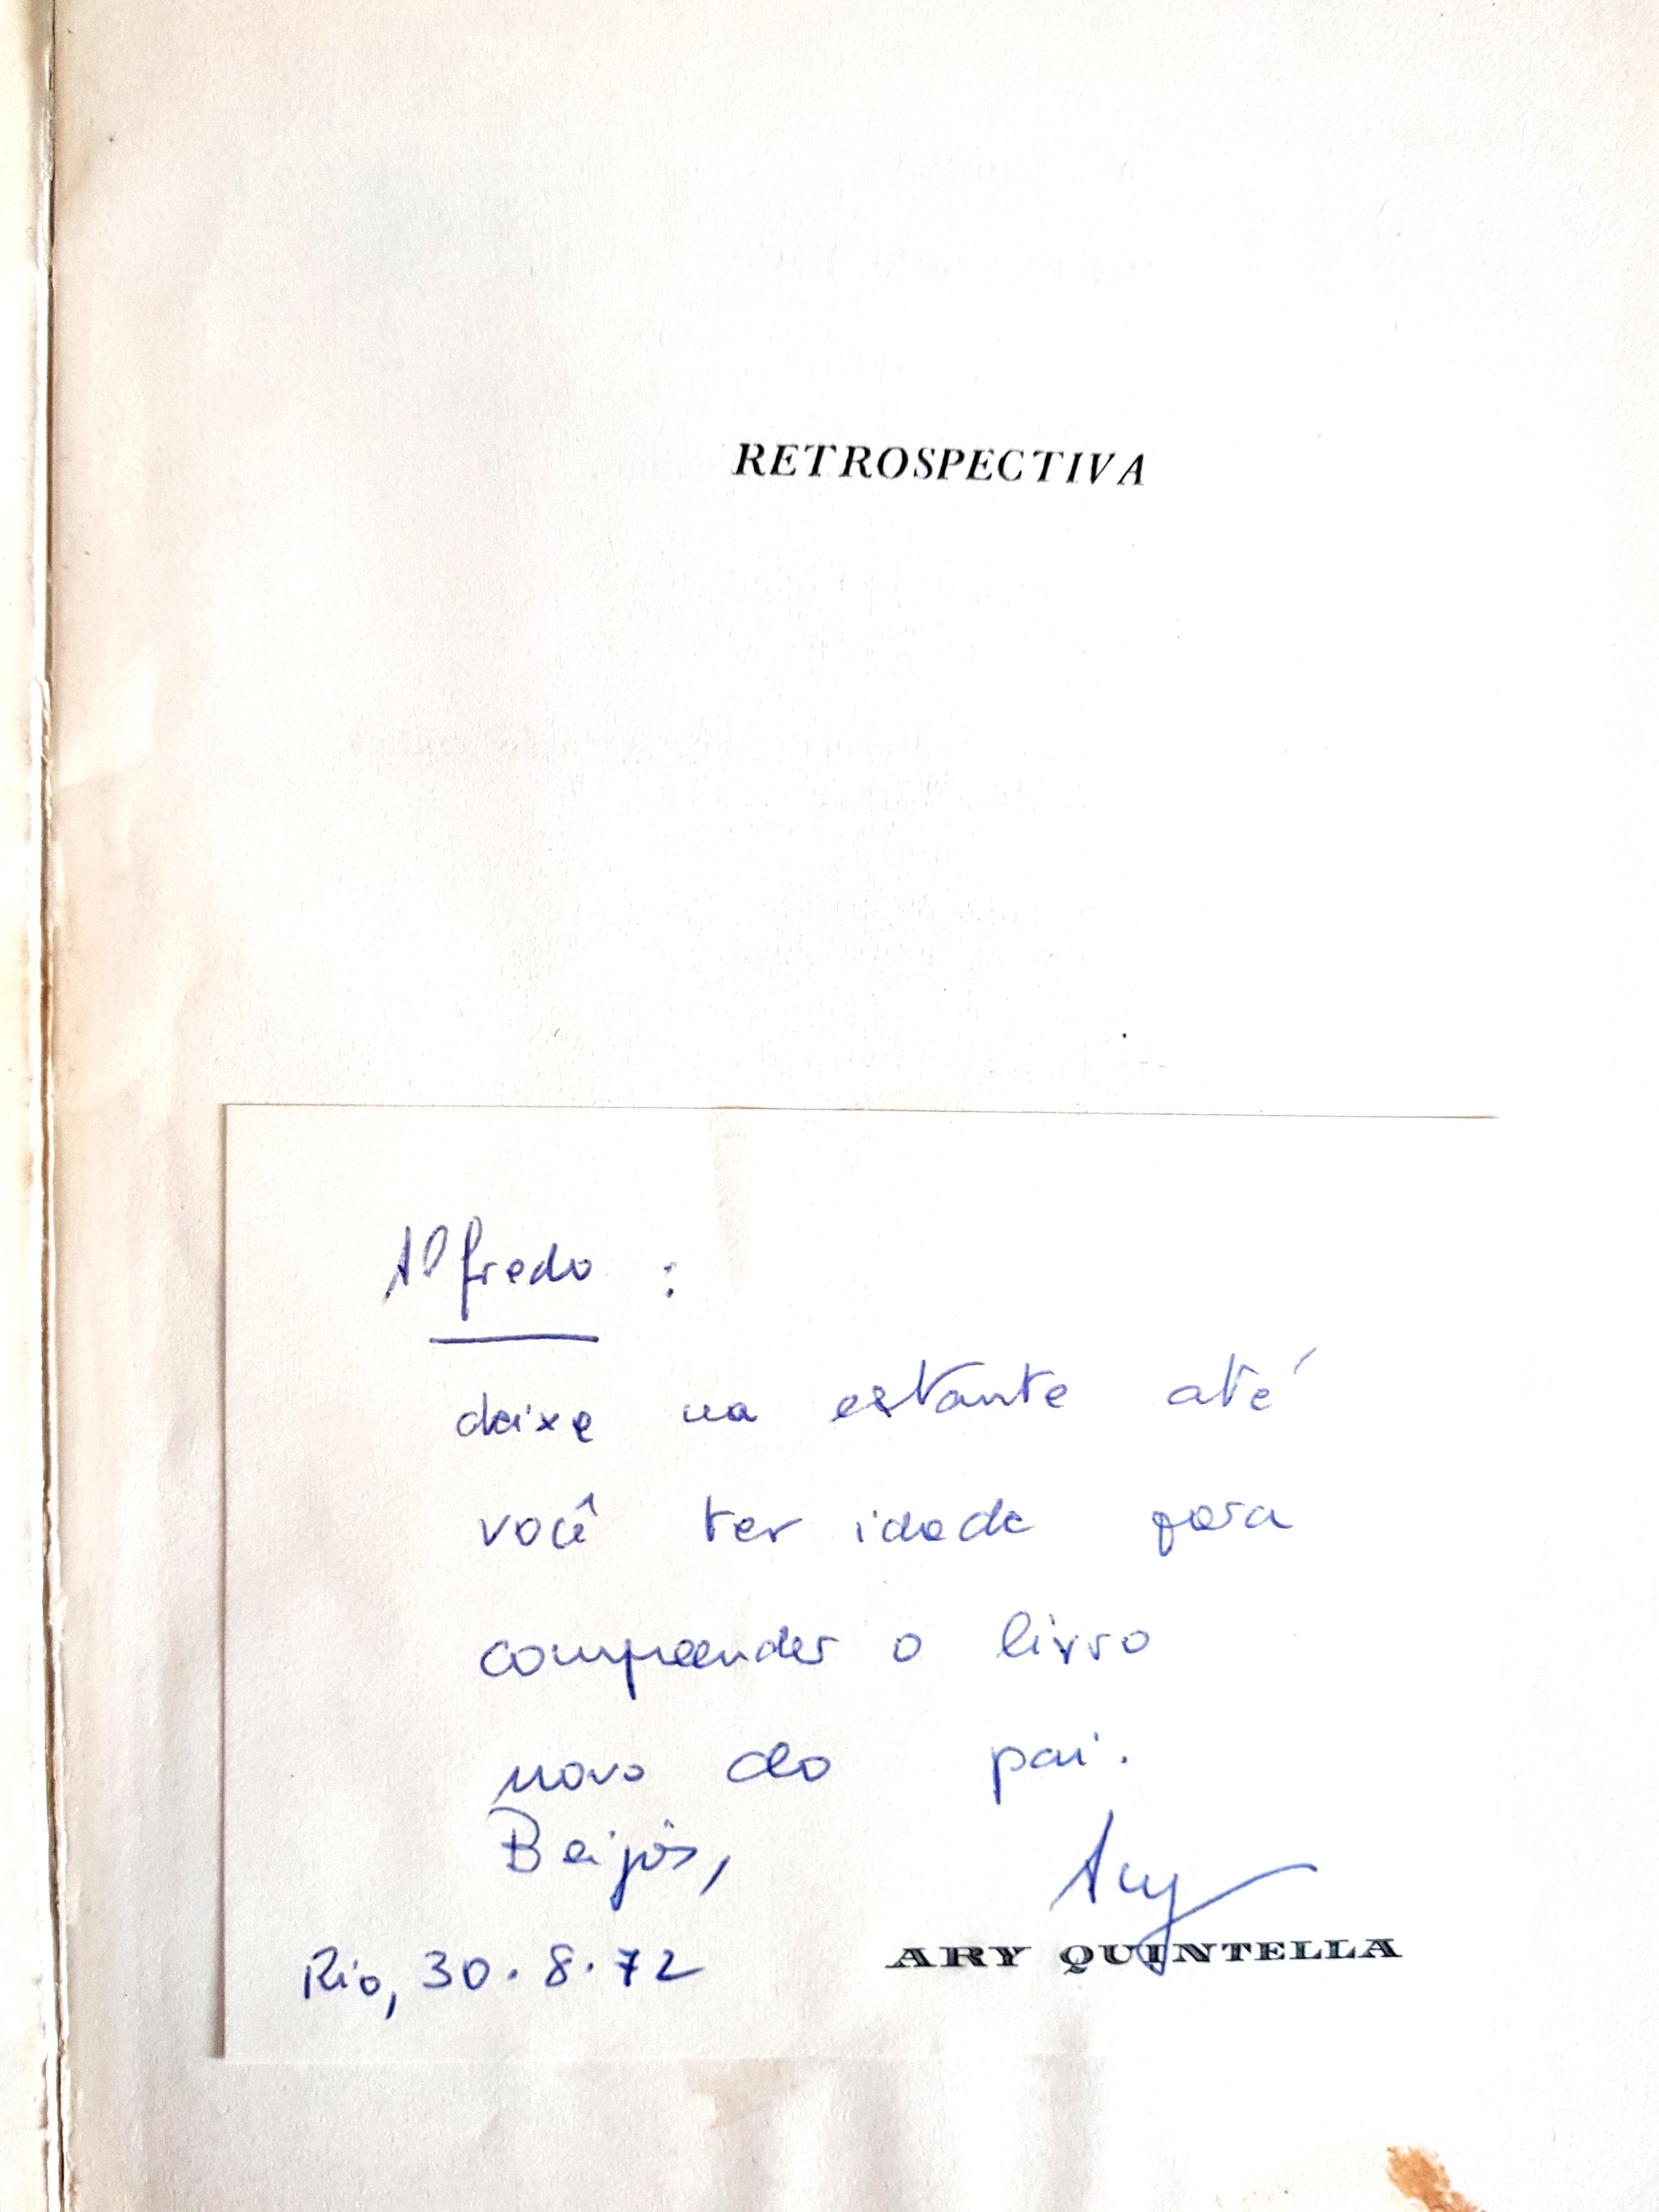 AlfredoQuintella.jpg